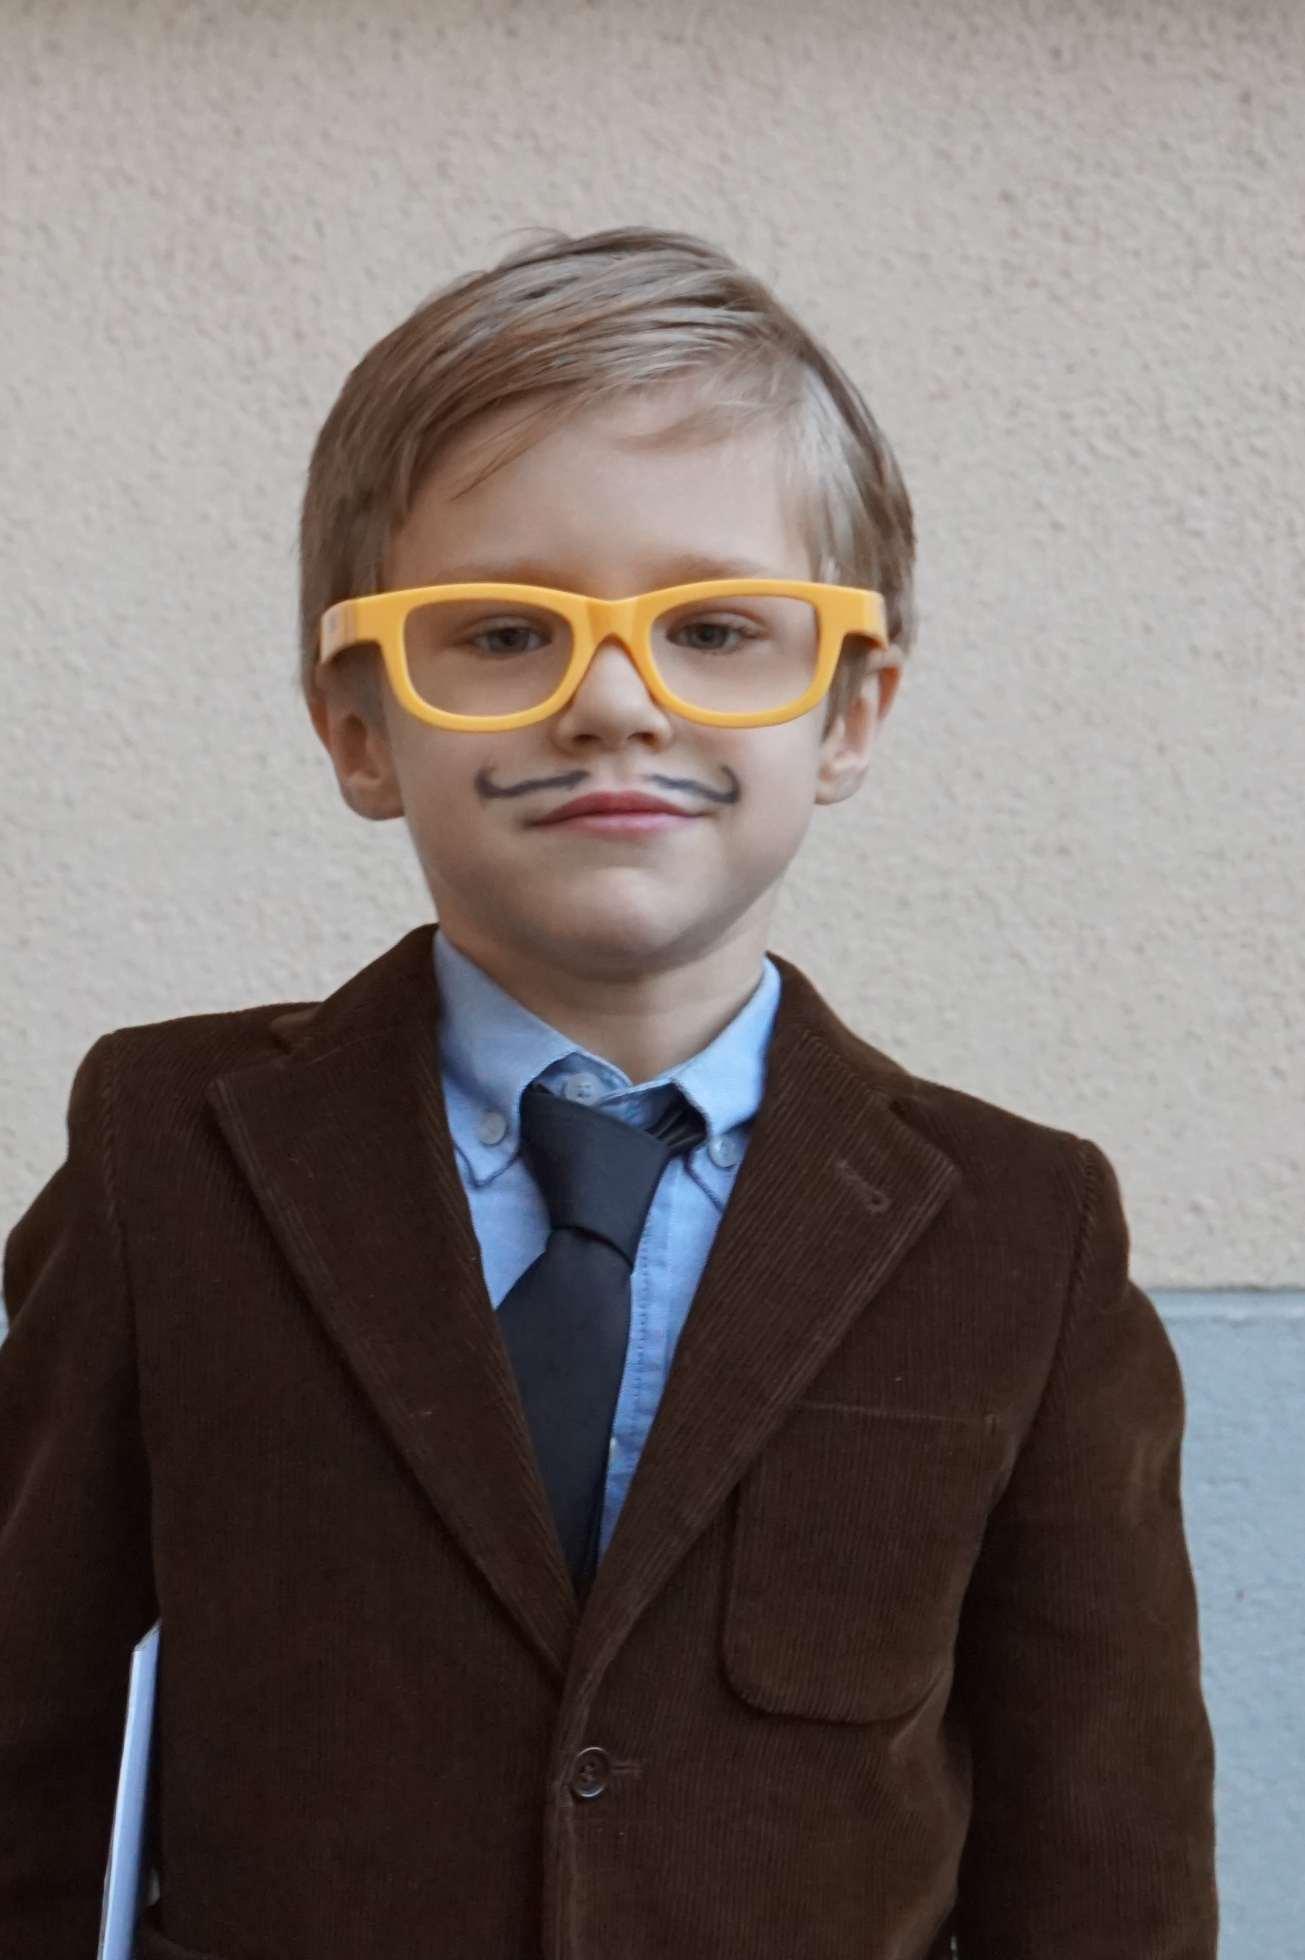 Disfraz niño barato facil 4-min